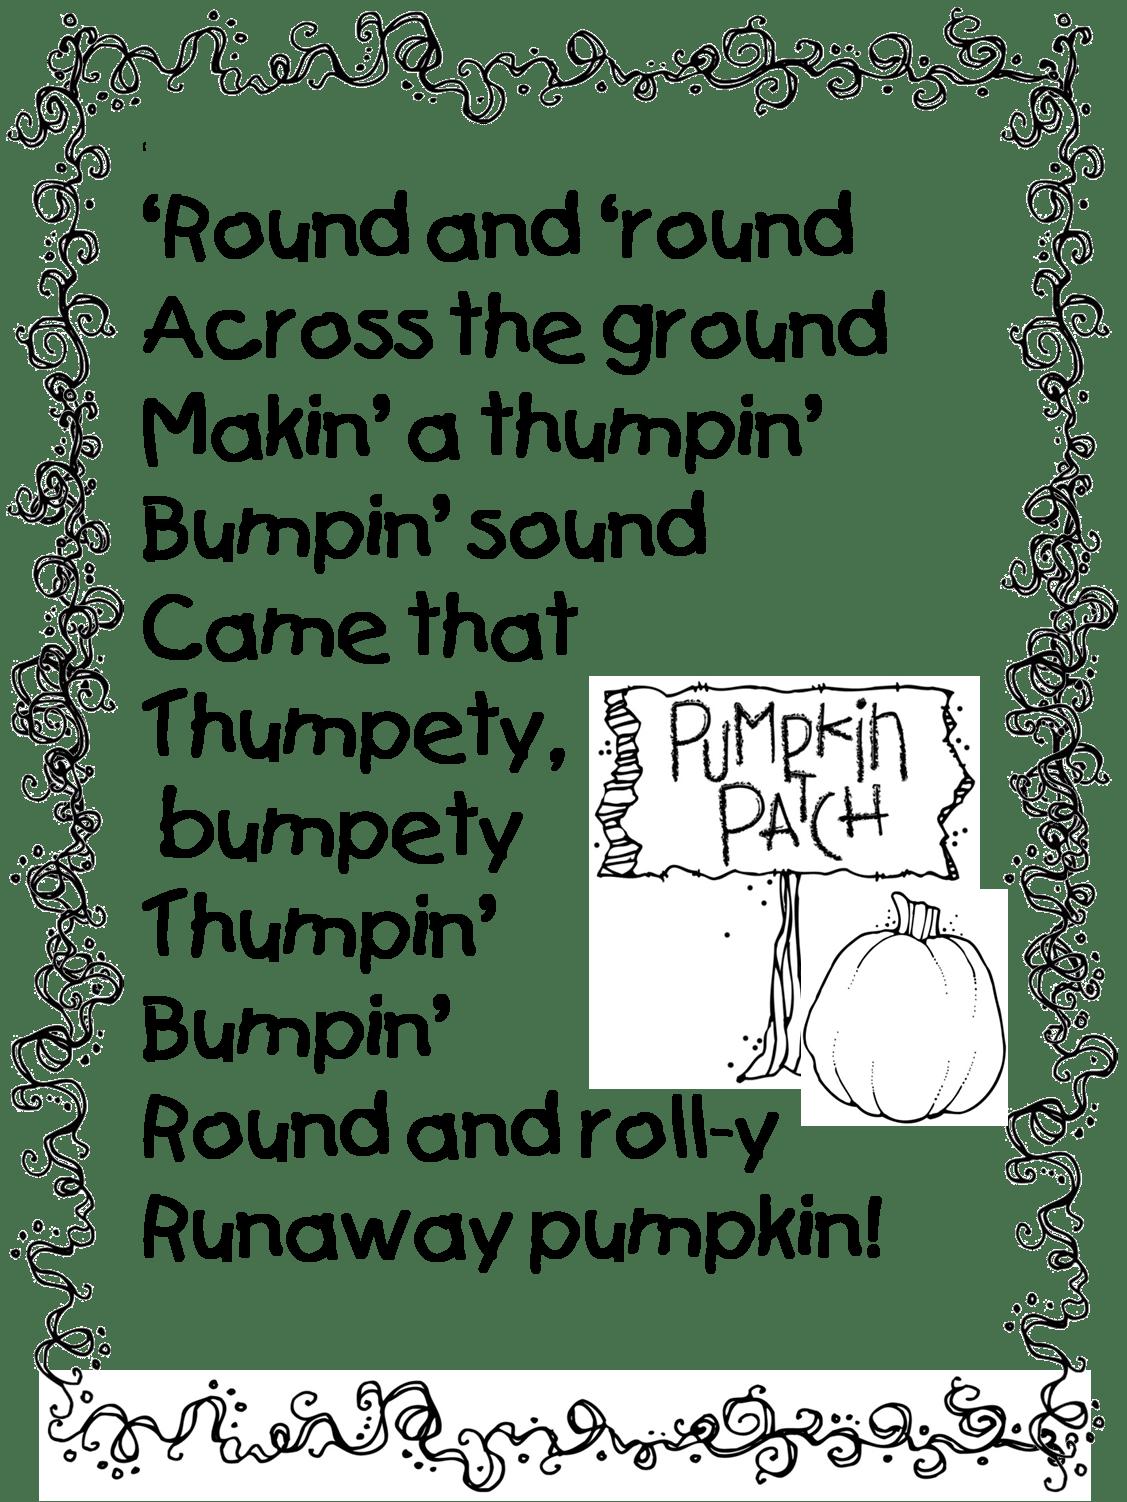 Pumpkin Poem From Runaway Pumpkin Book